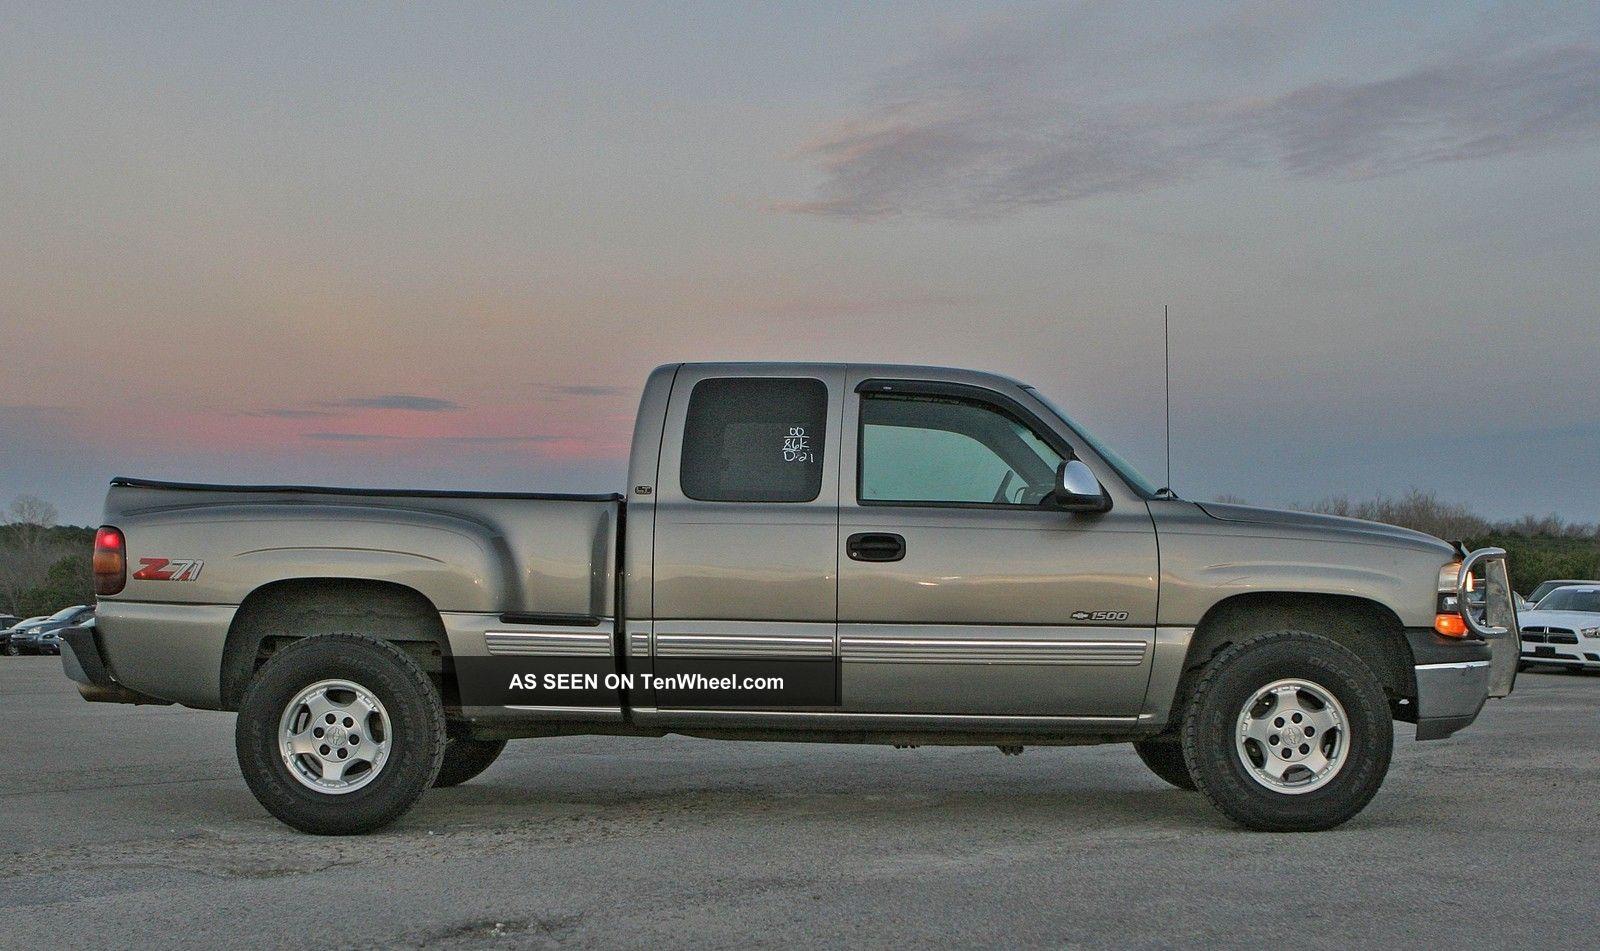 2000 chevrolet silverado 1500 lt extended cab pickup 3 for 2000 chevy silverado window motor